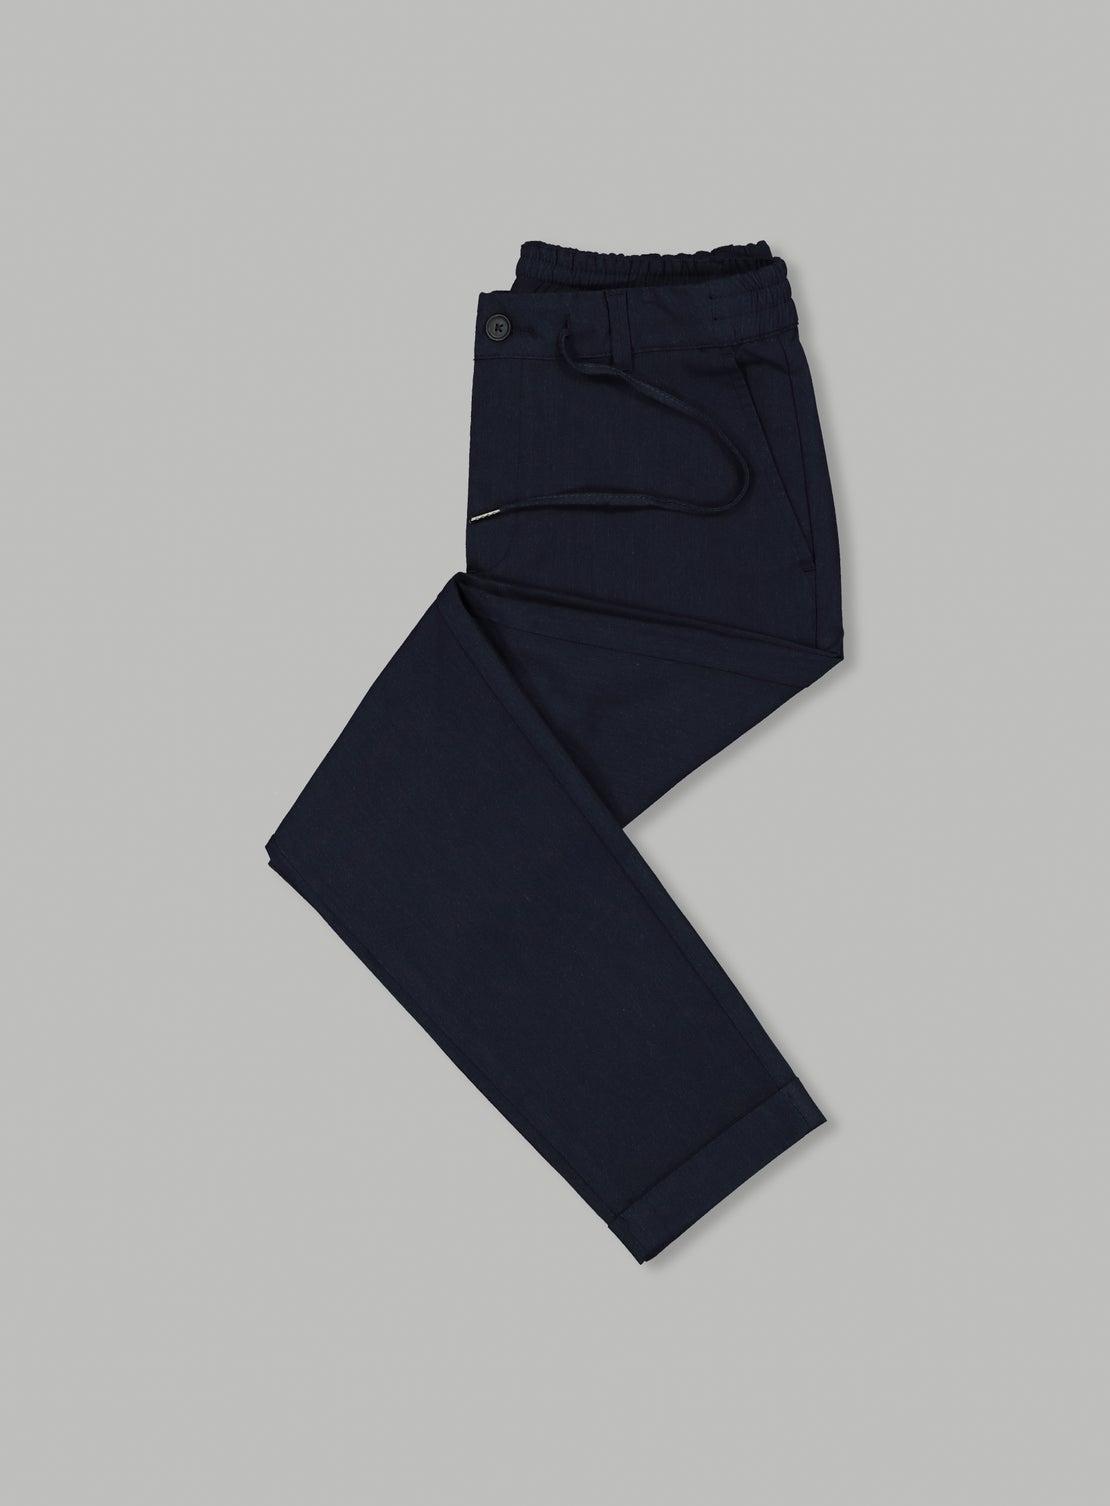 Dusty Navy Drawstring Trouser